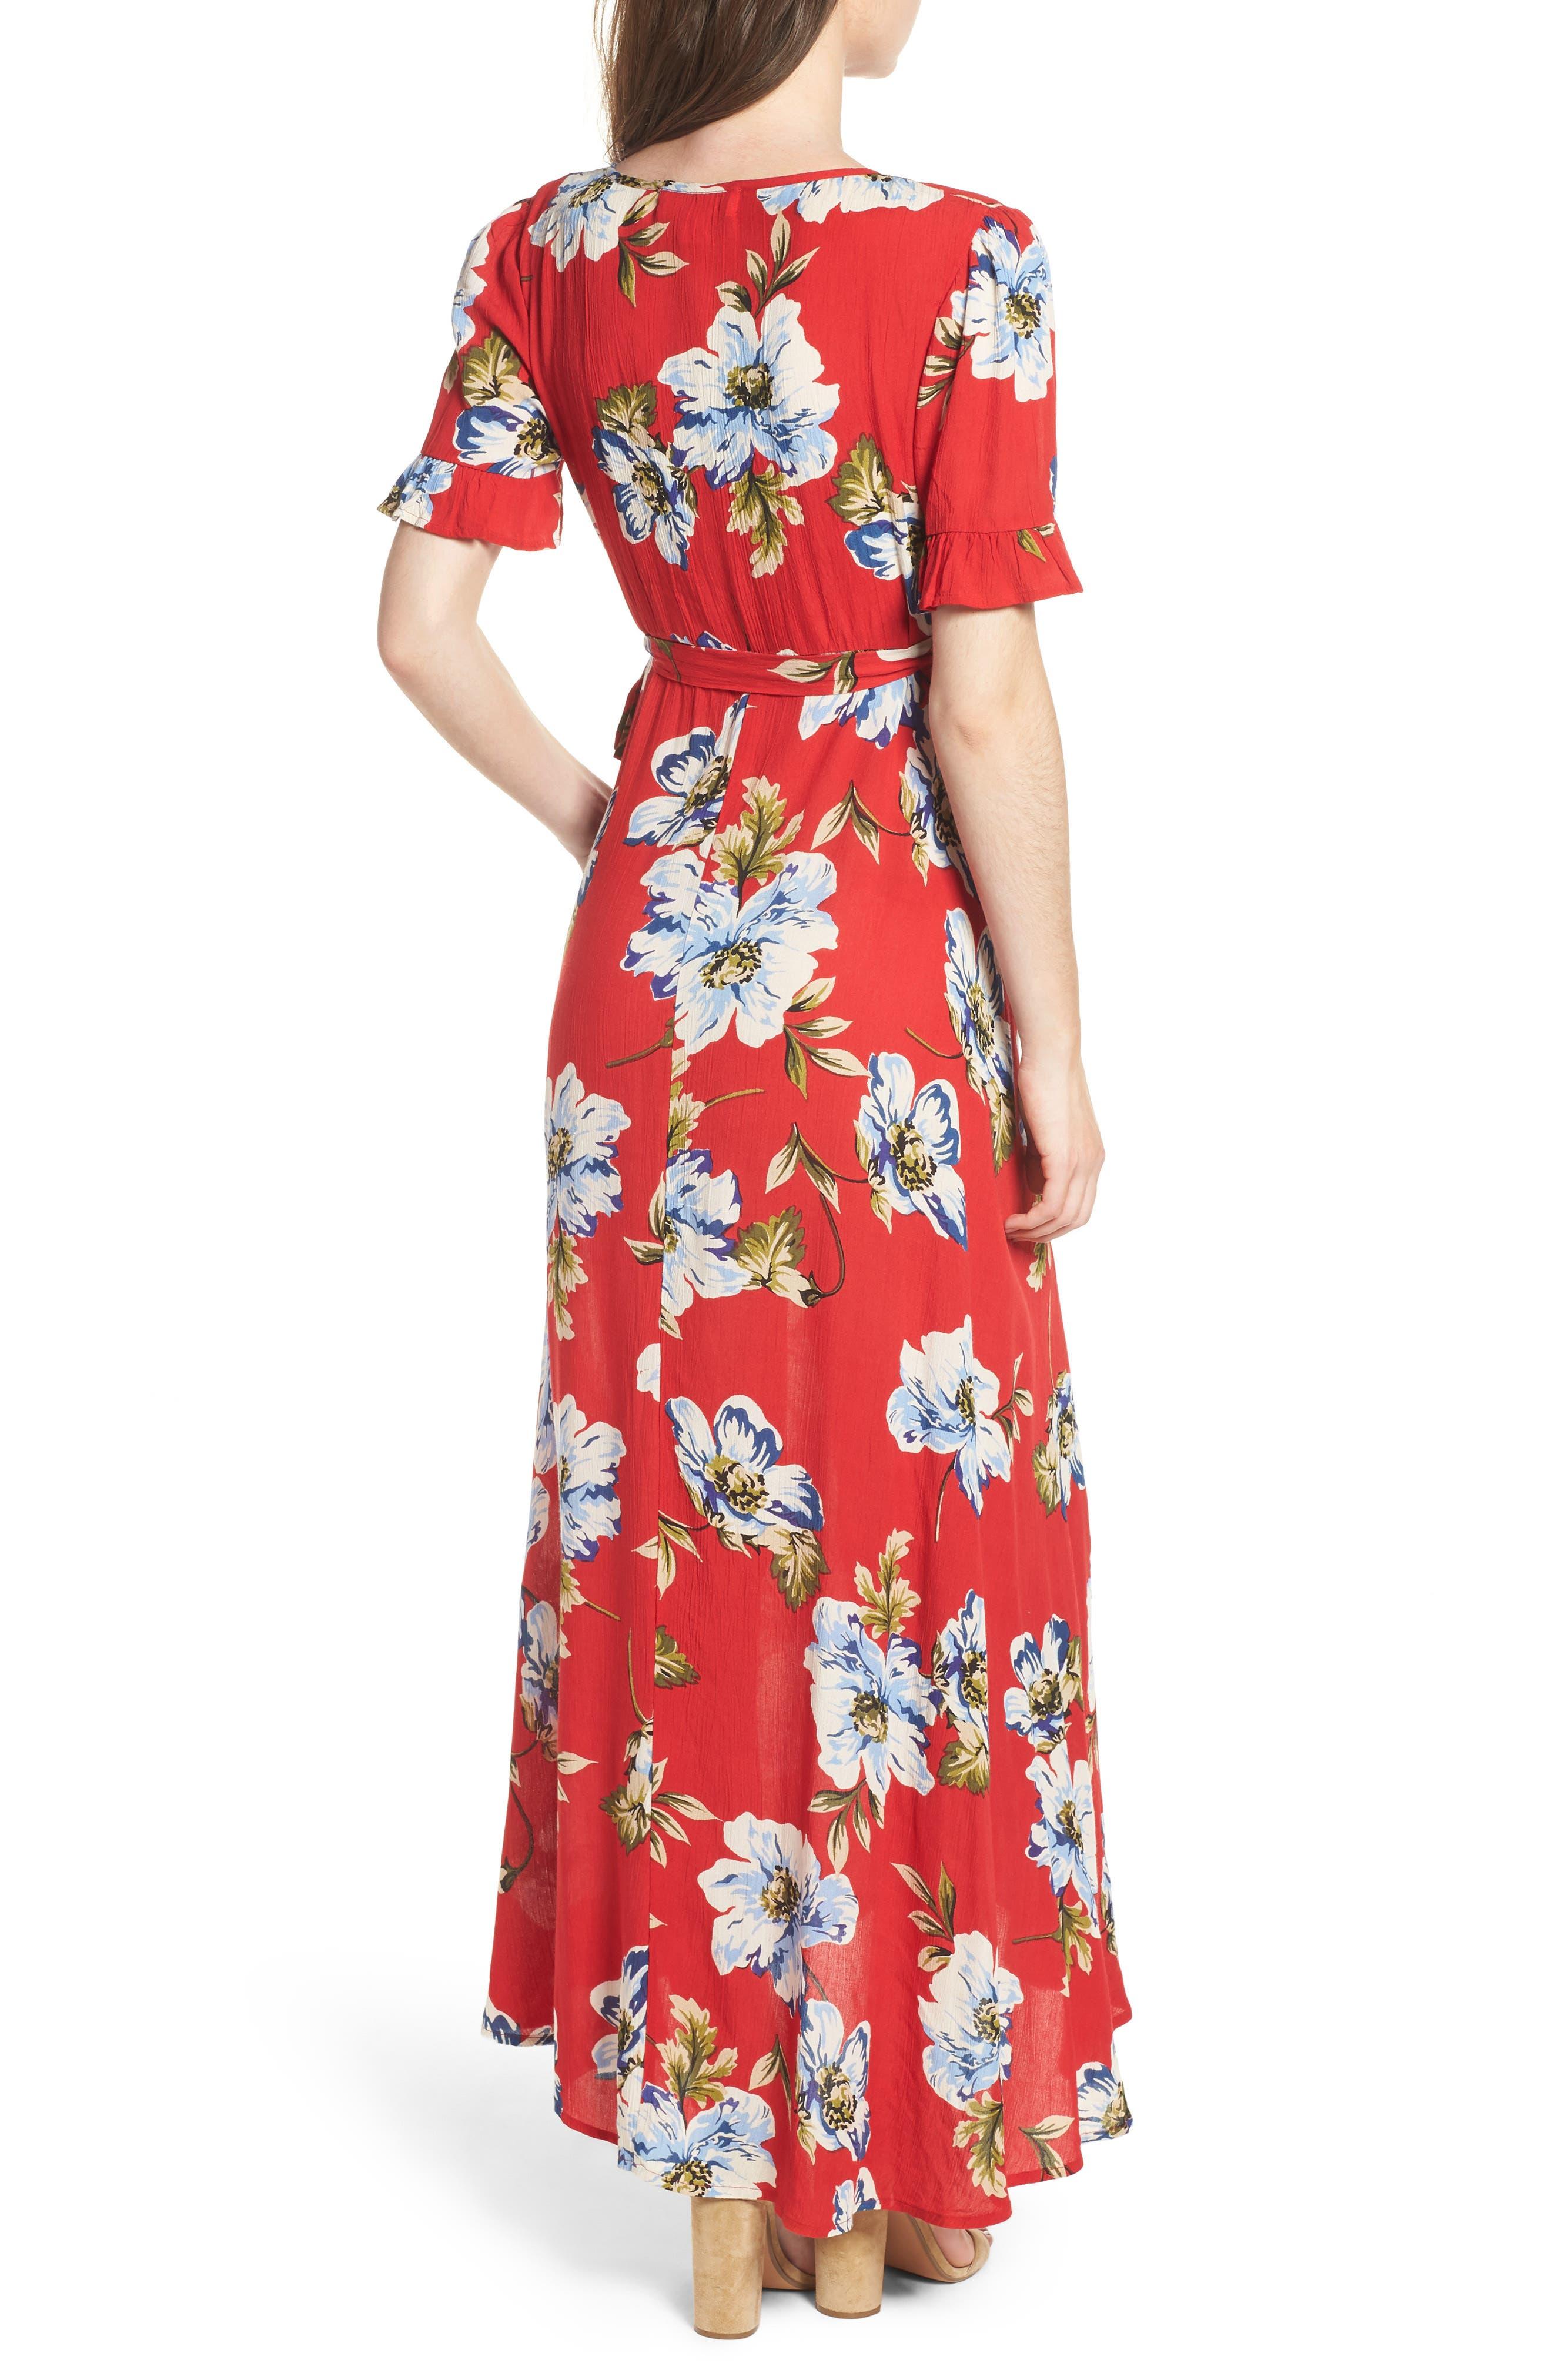 Blue Moon Floral Print Wrap Dress,                             Alternate thumbnail 2, color,                             Red/ Sky